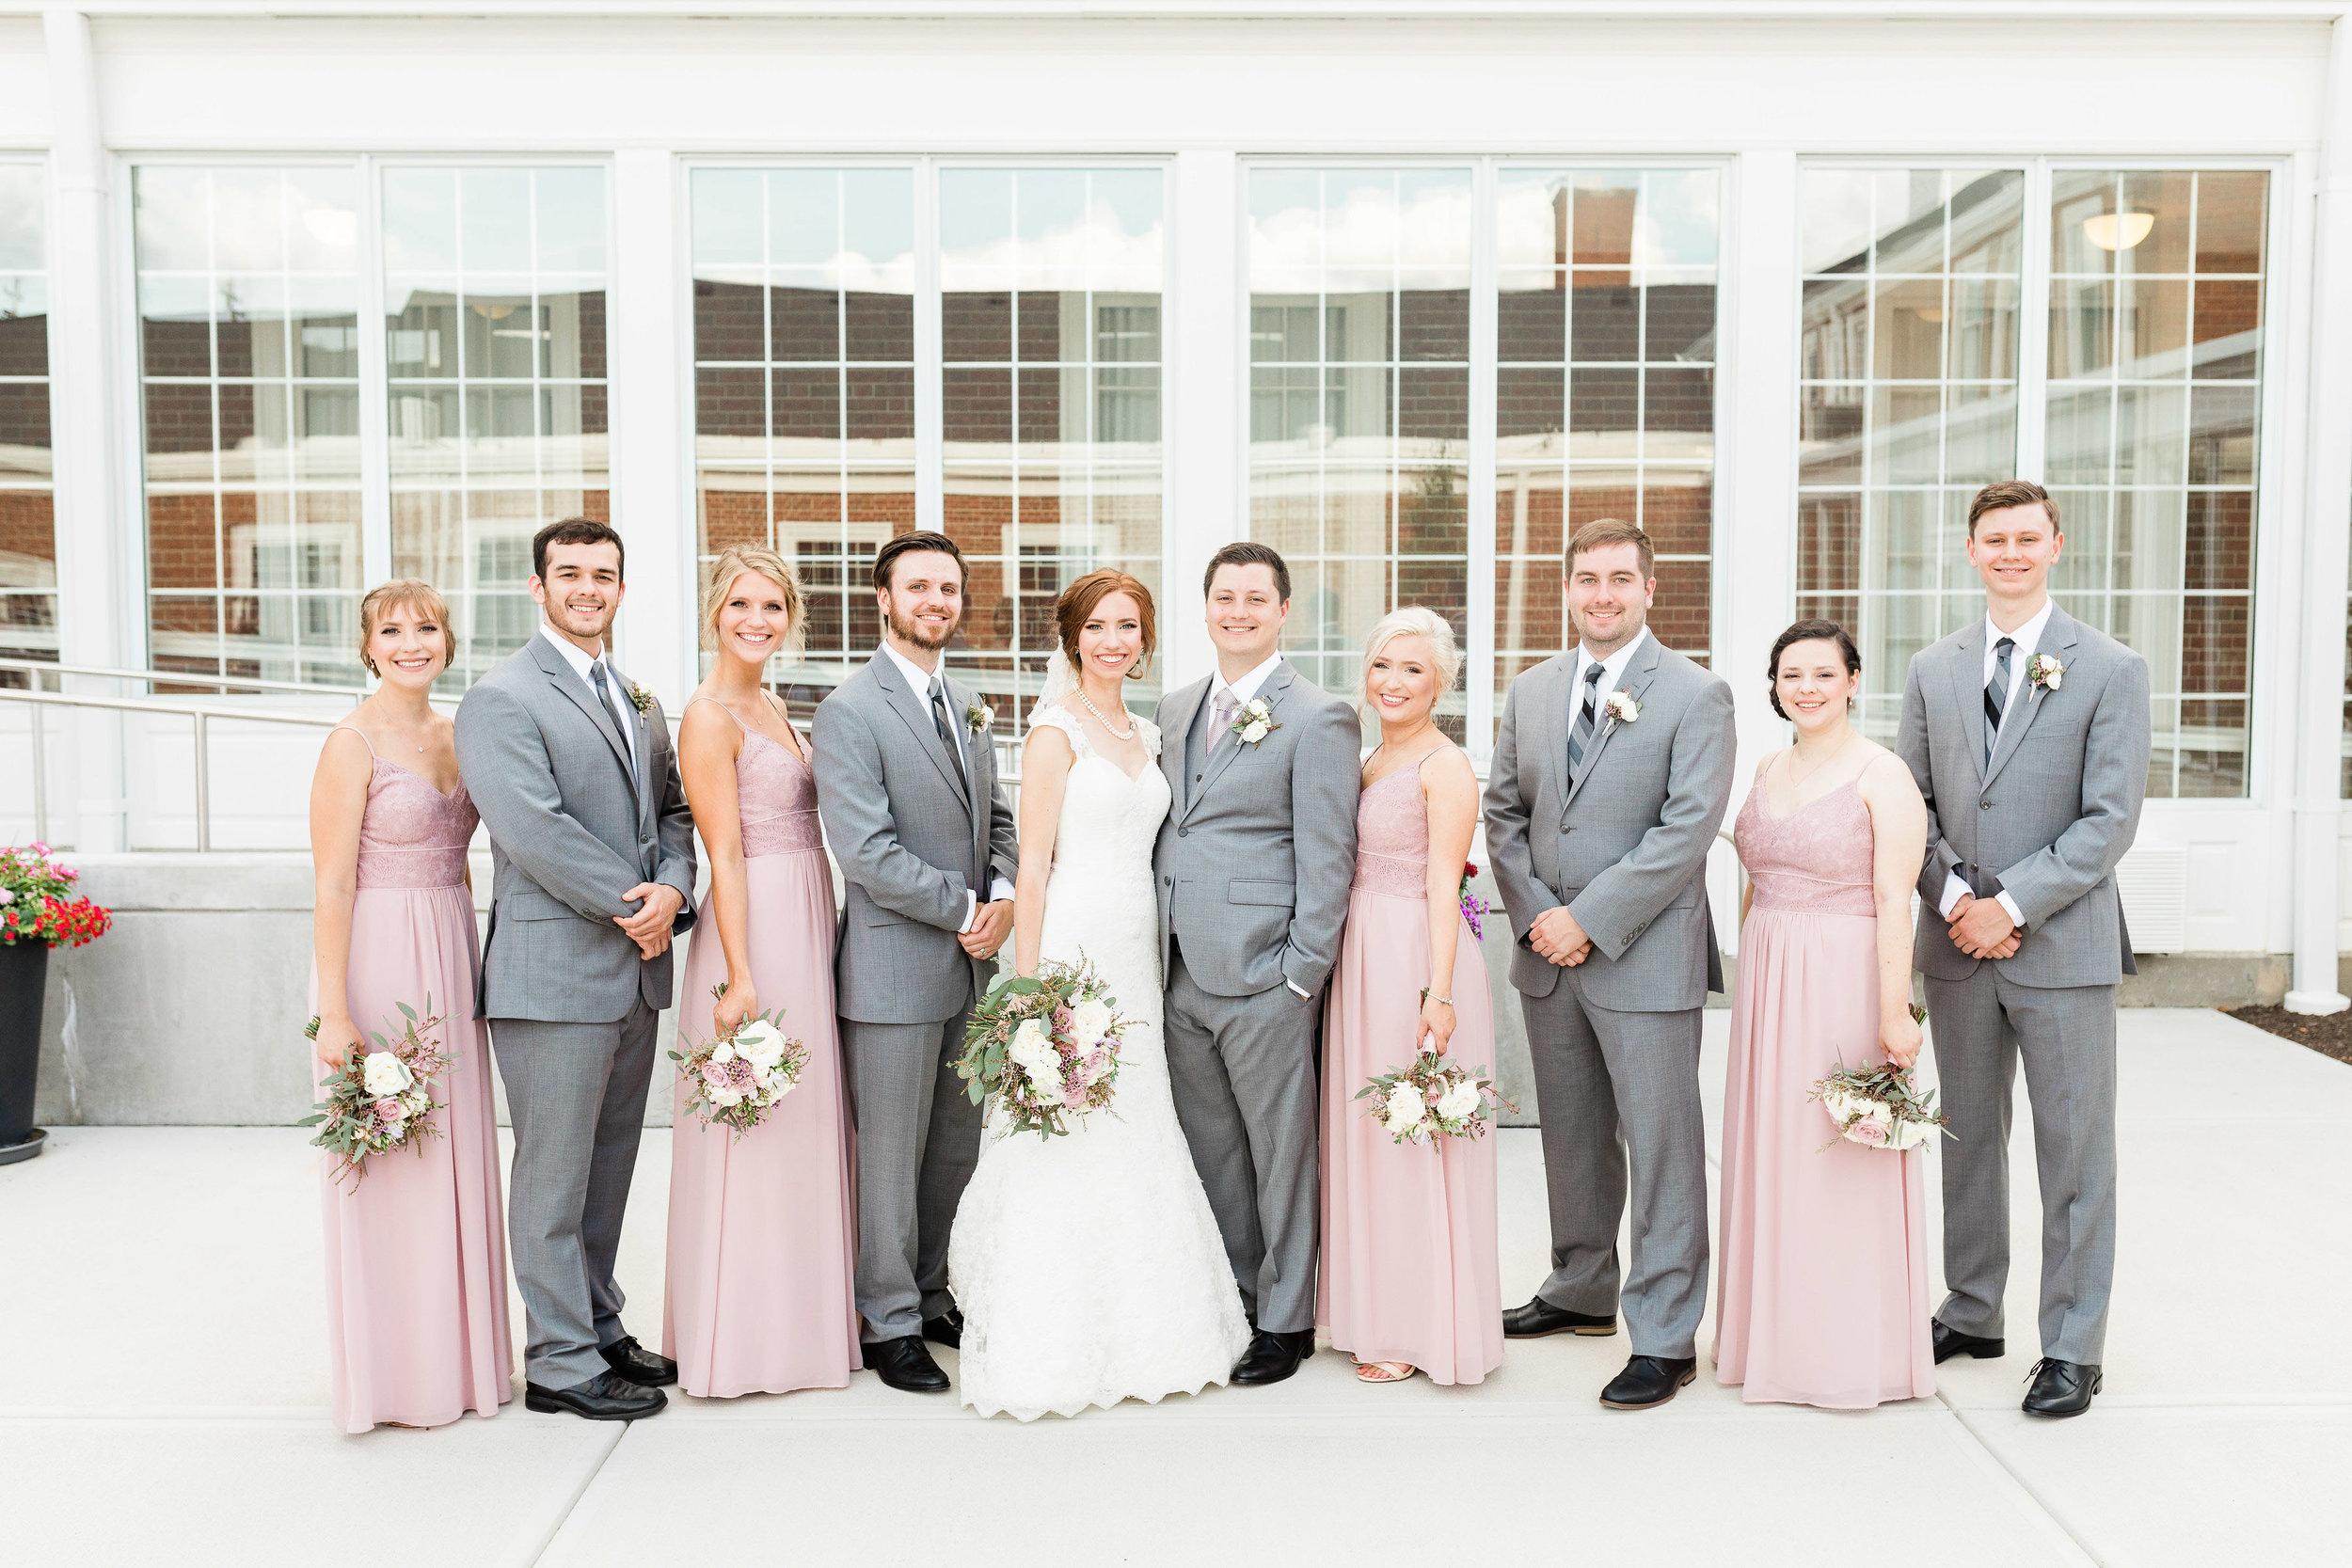 lauren day photography cincinnati wedding photographer bridal party pictures-7.jpg